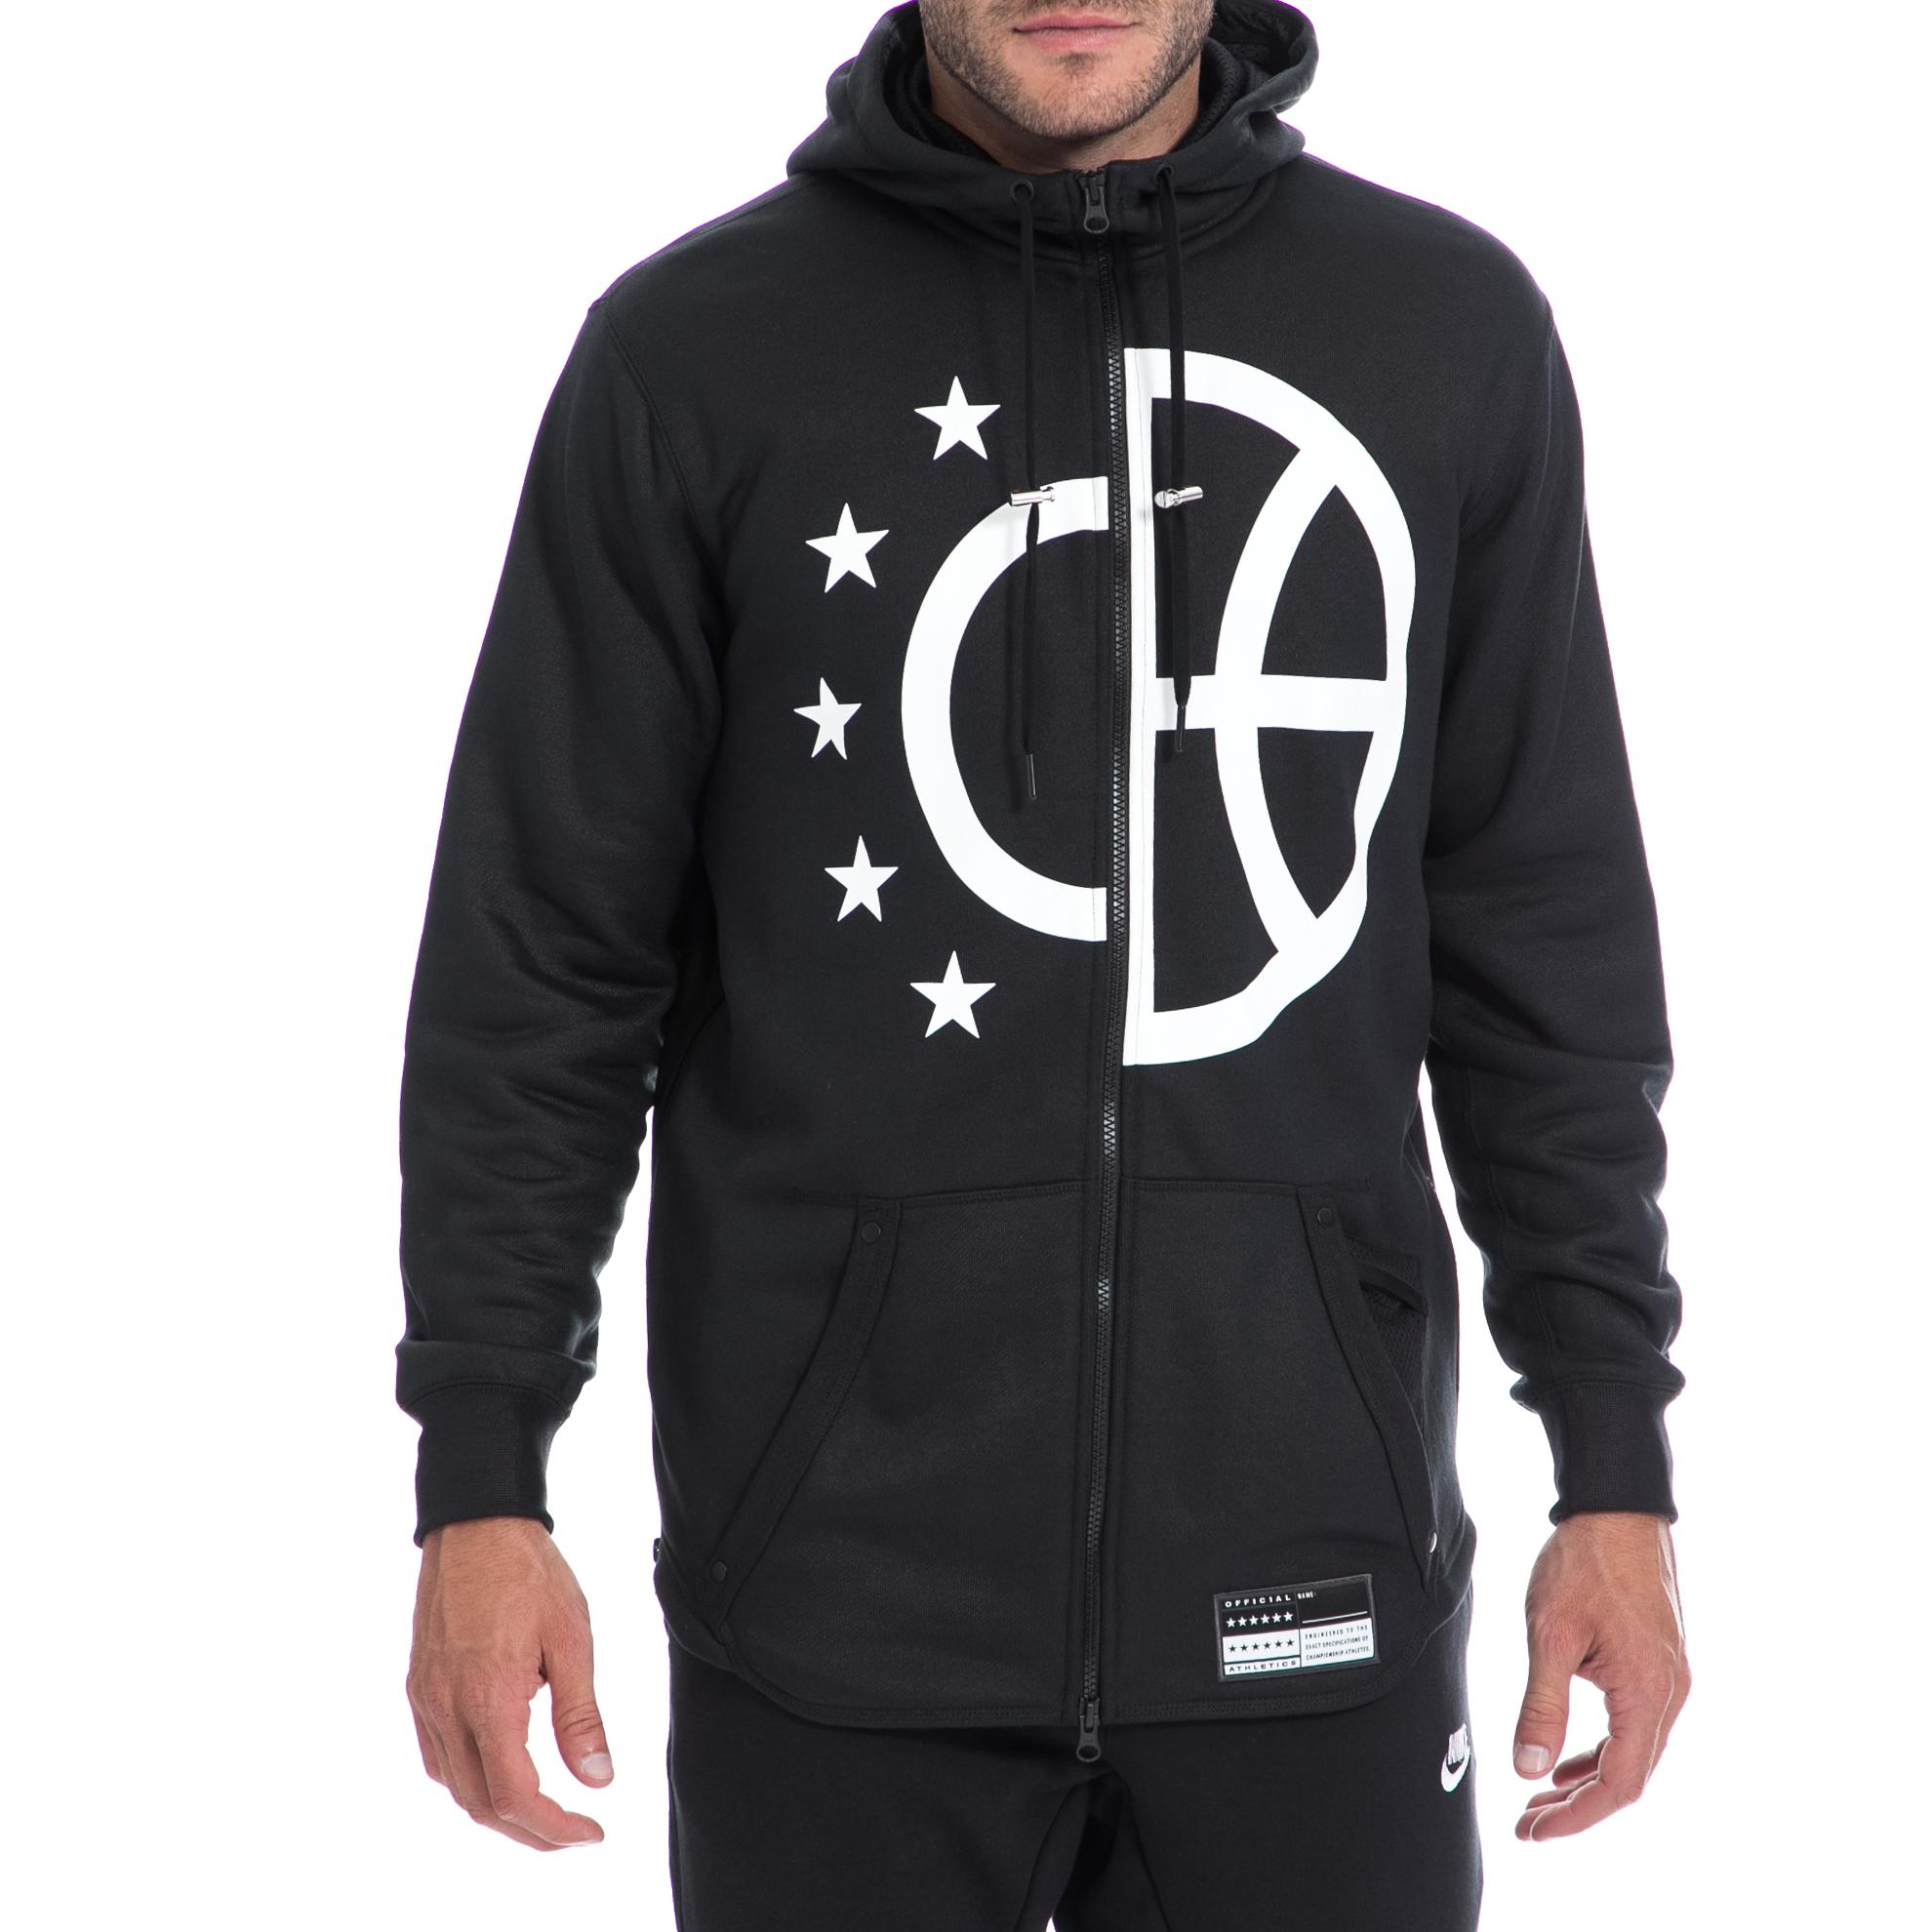 NIKE - Αντρική ζακέτα NIKE μαύρη ανδρικά ρούχα αθλητικά φούτερ μακρυμάνικα